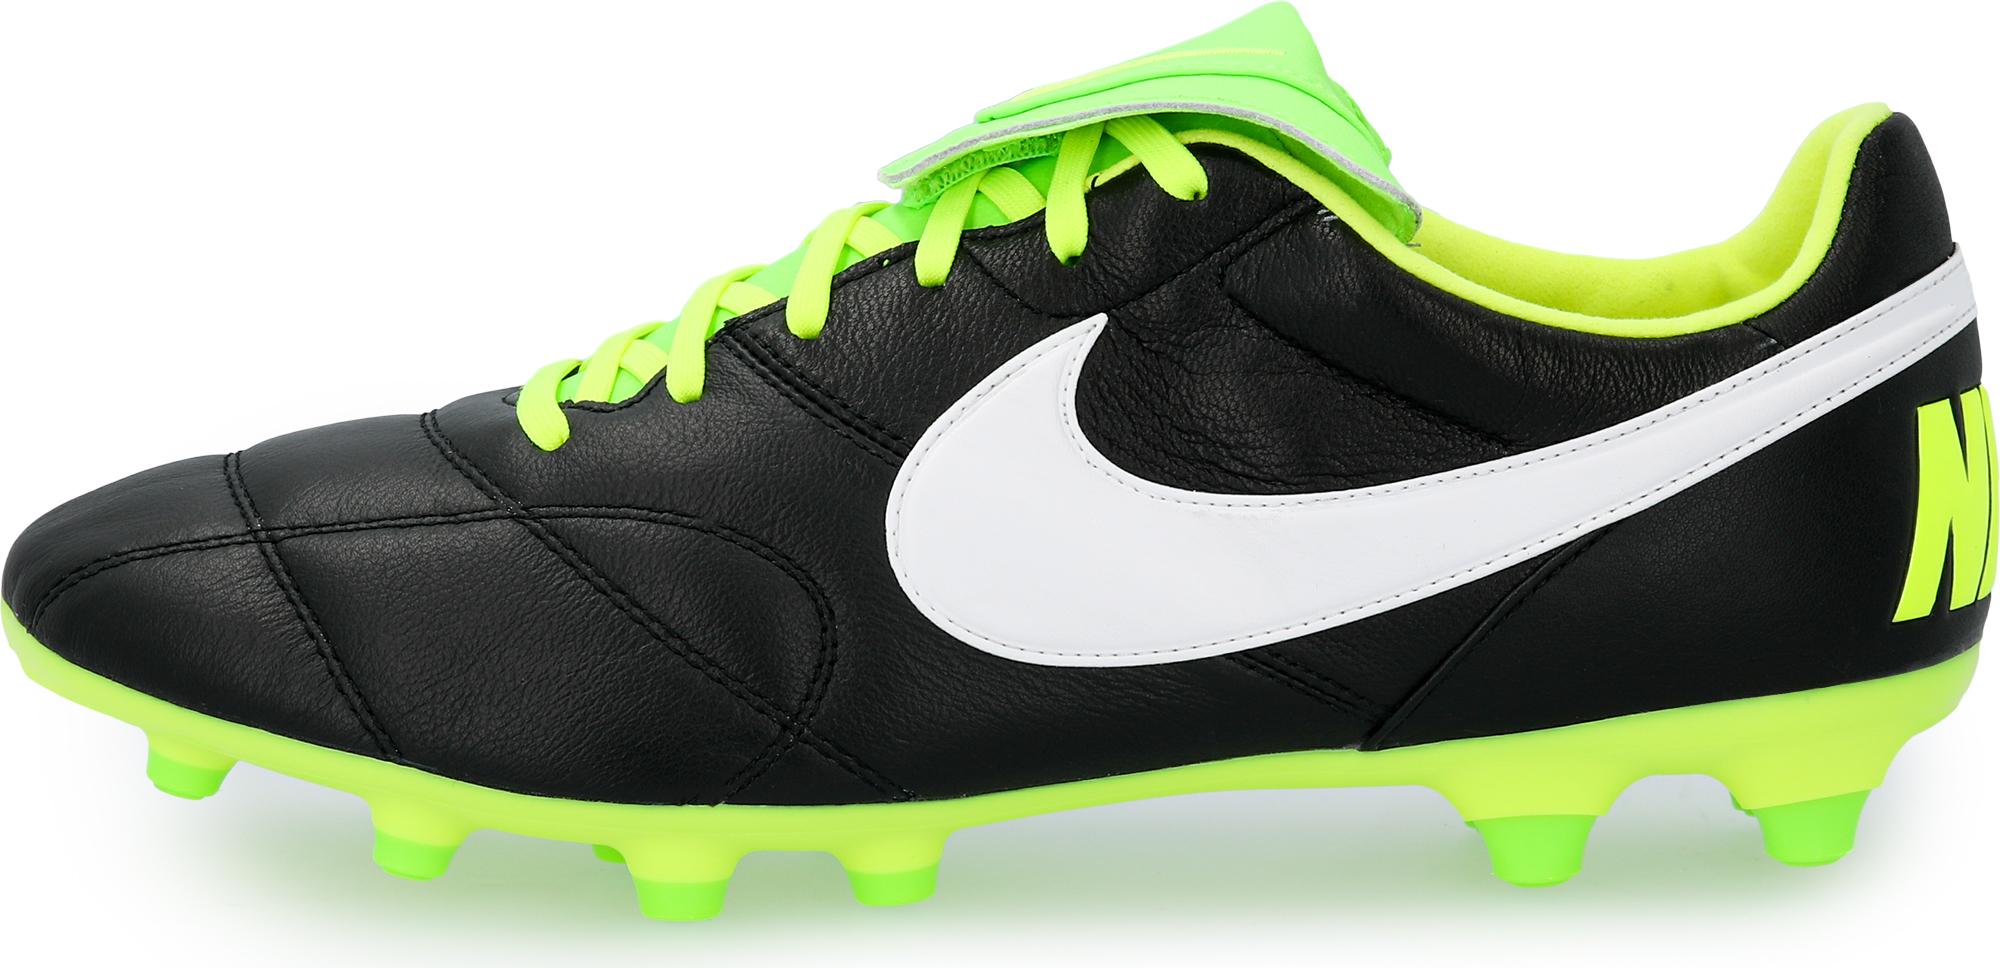 Nike Бутсы мужские Nike Premier Ii Fg, размер 41.5 бутсы decathlon fg clr500 kipsta